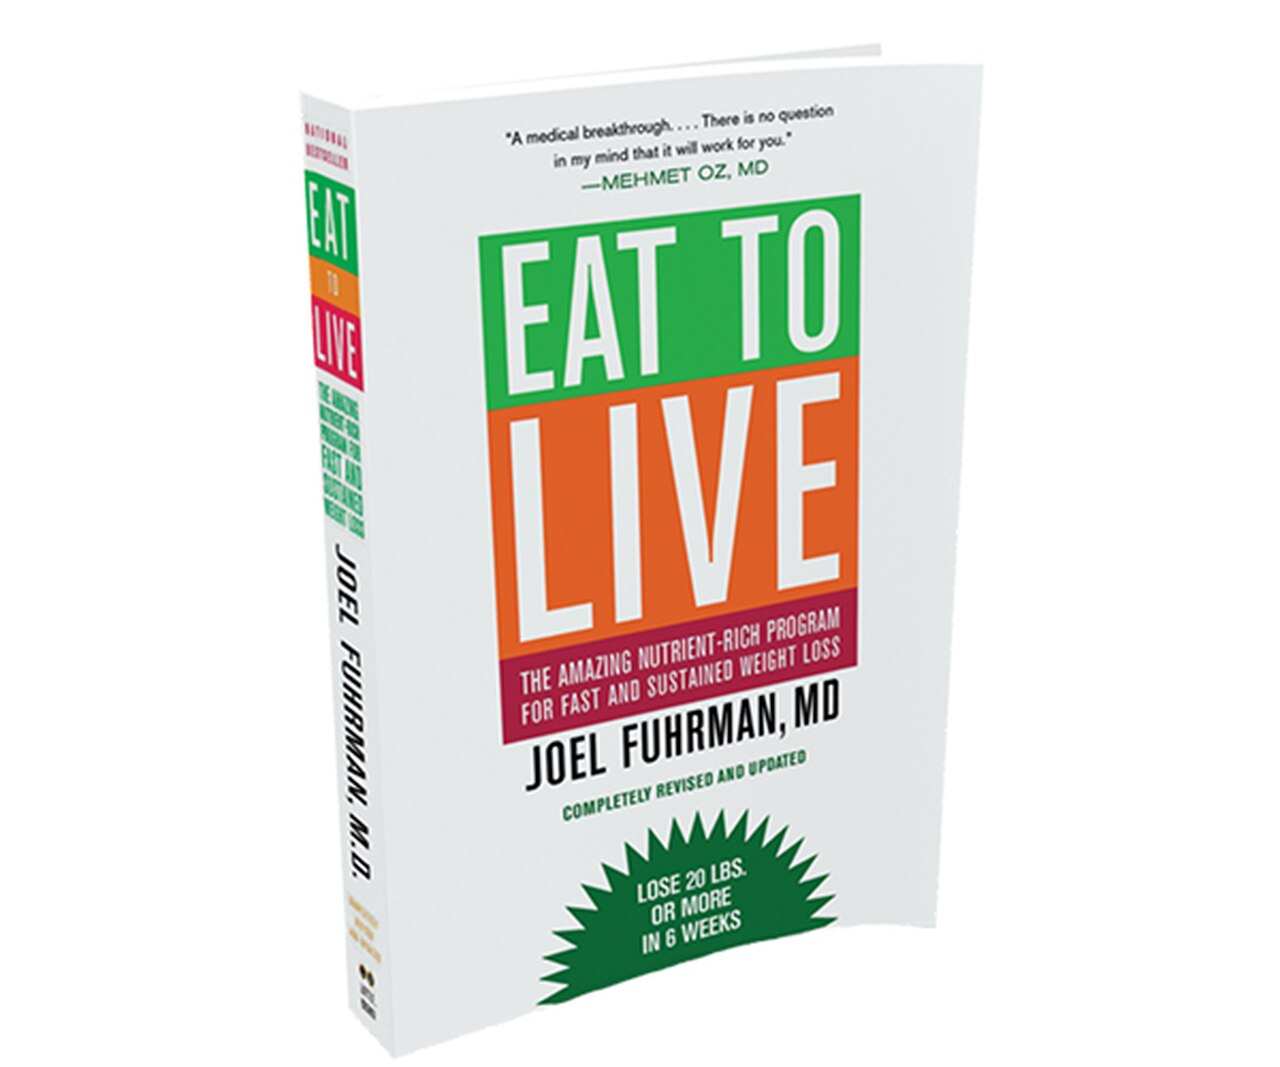 eat to live.jpg